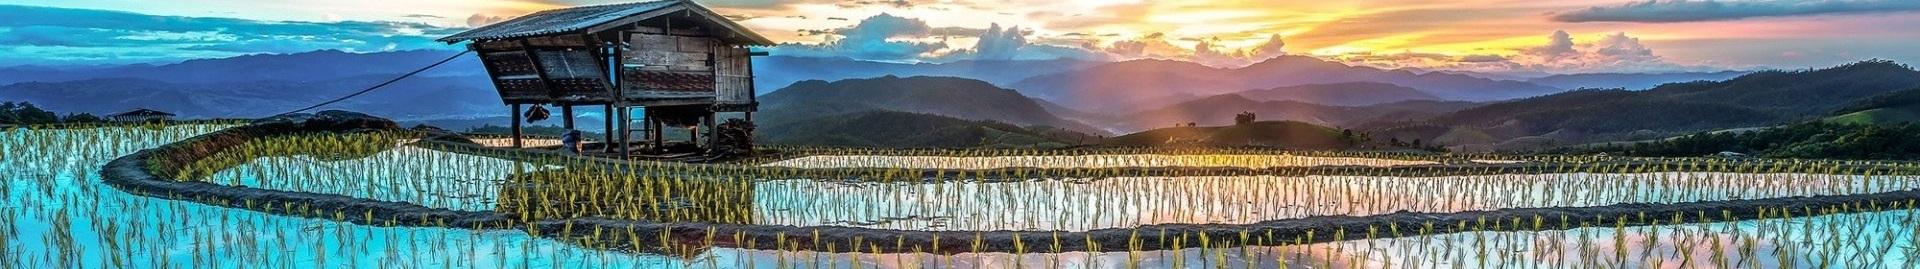 Plantacion de arroz en Asia 1 - Panoramica